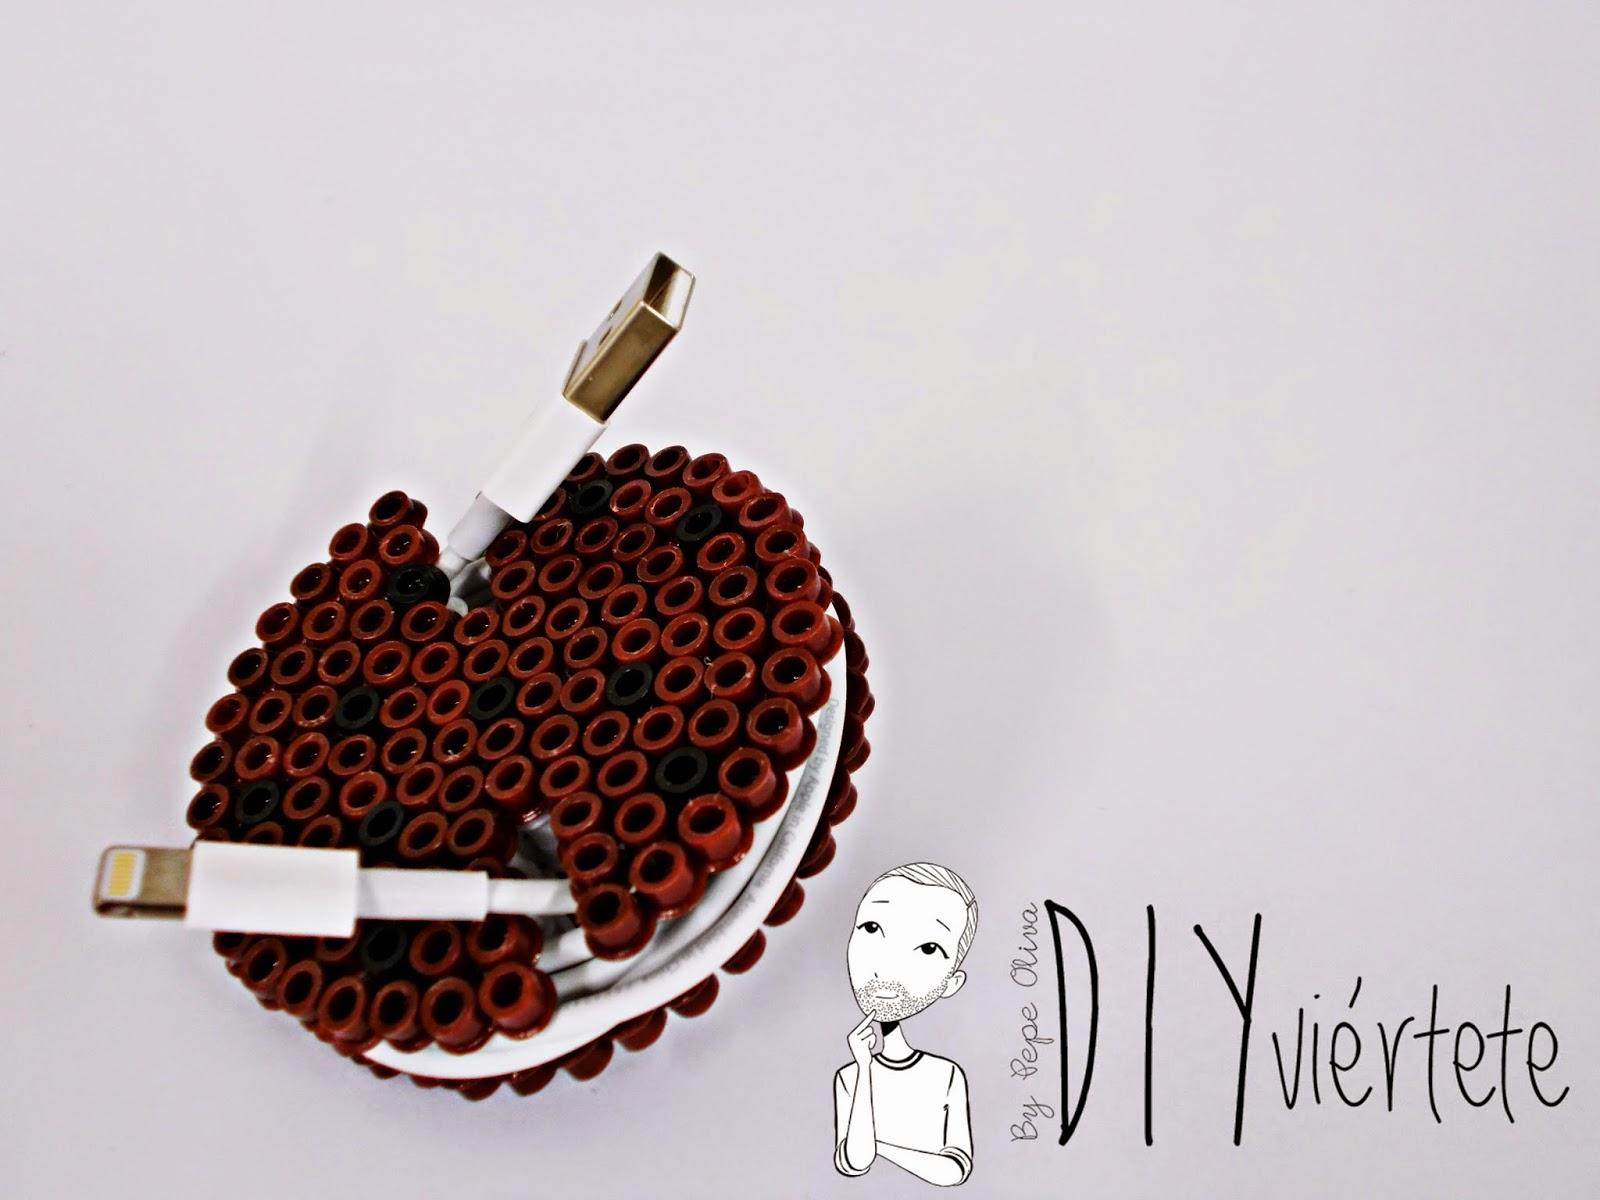 DIY-Hama Beads-ideas-galleta-cookie-guarda auriculares-cables-organizador-1